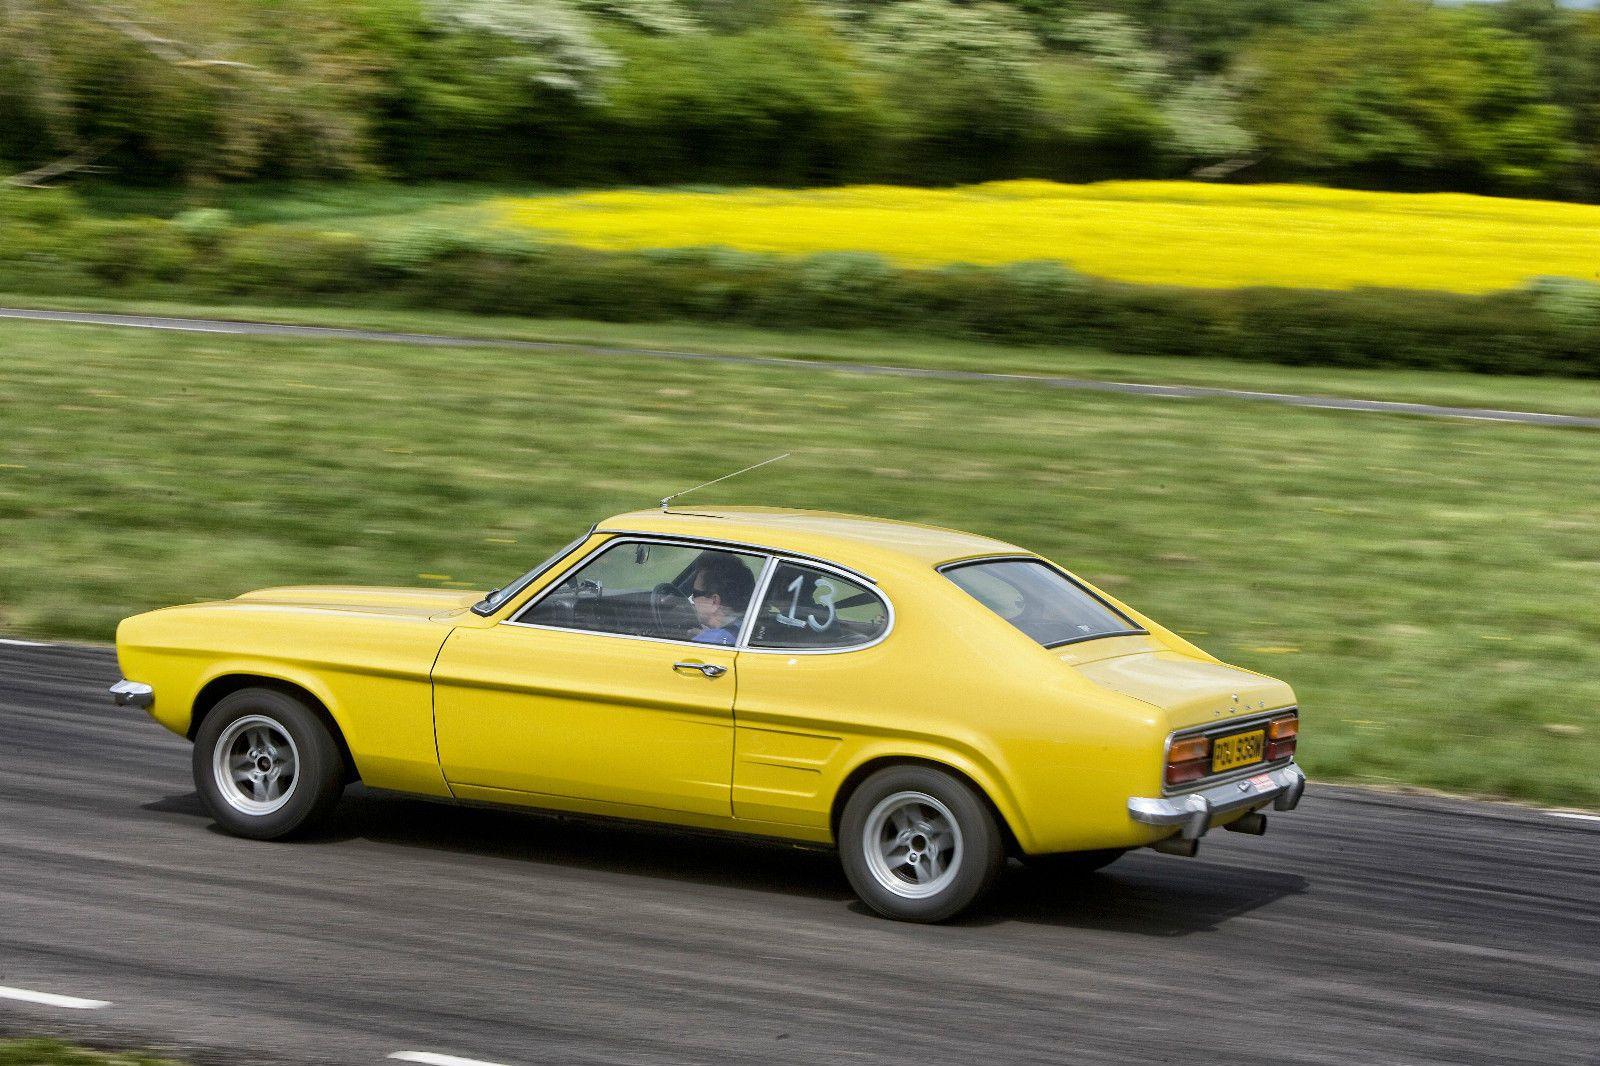 http://www.ebay.co.uk/itm/Ford-Capri-Mk1-Perena-inspired-302-Ford-V8 ...